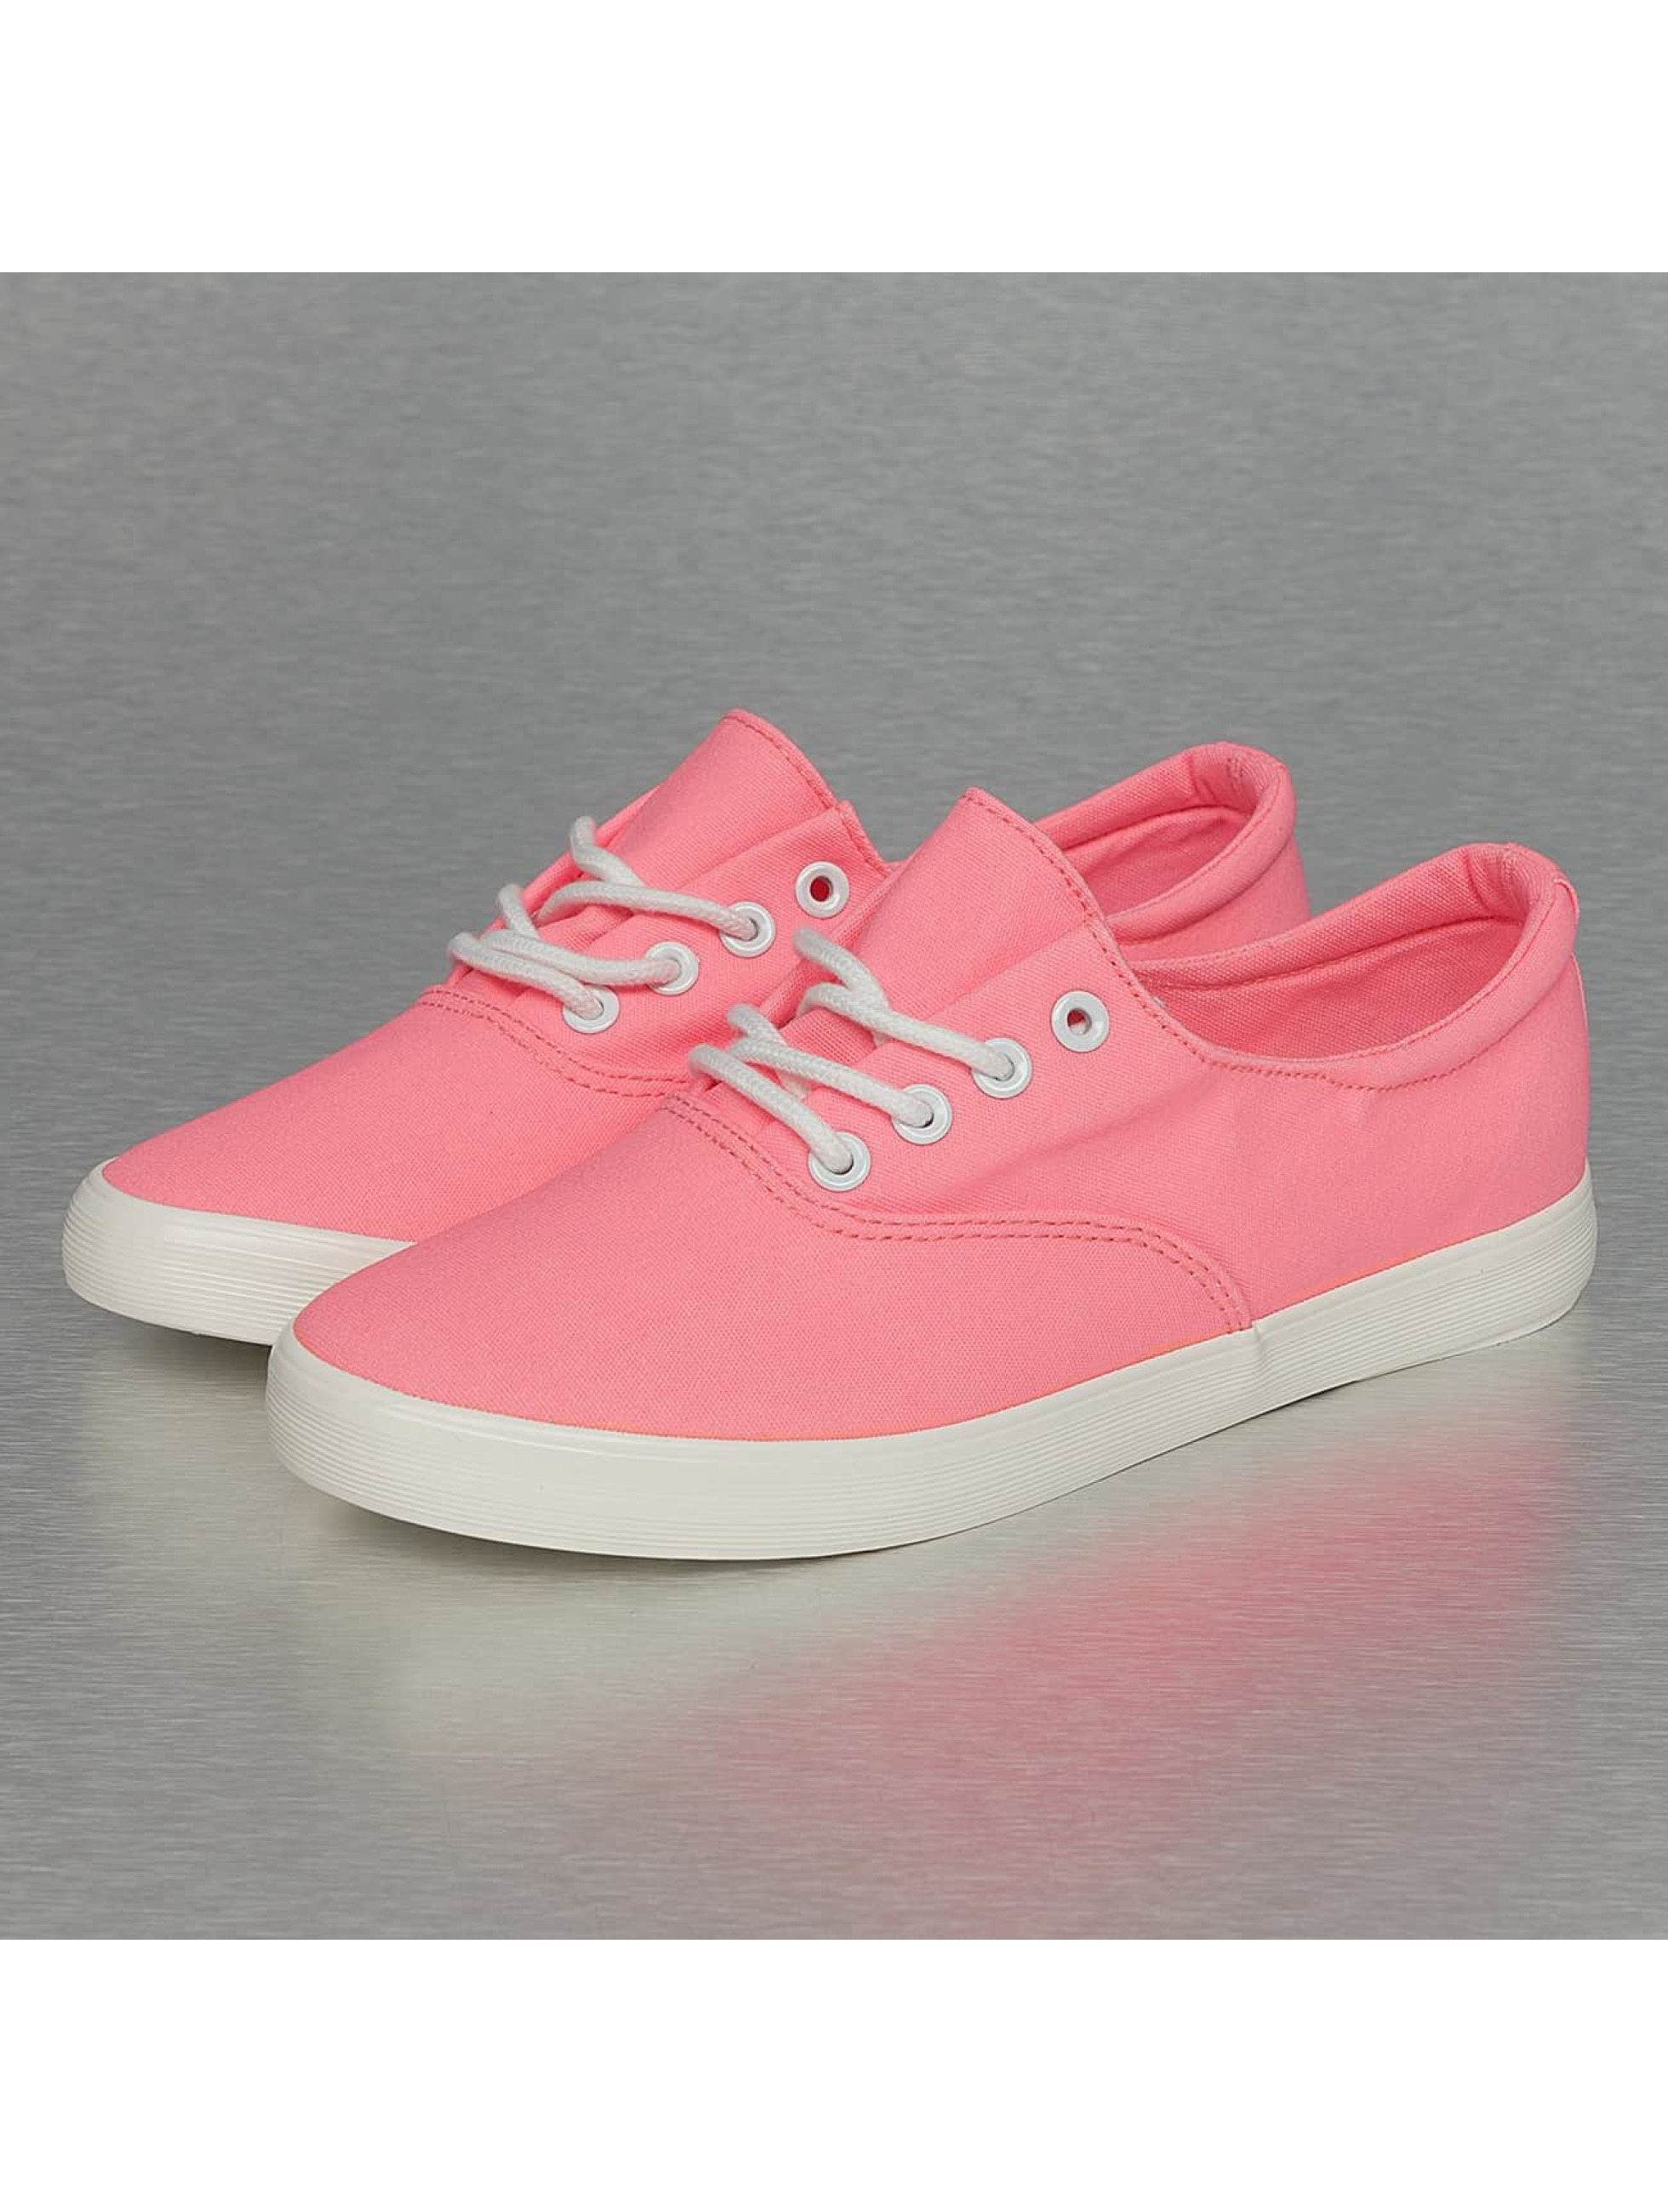 Jumex Frauen Sneaker Summer in rosa